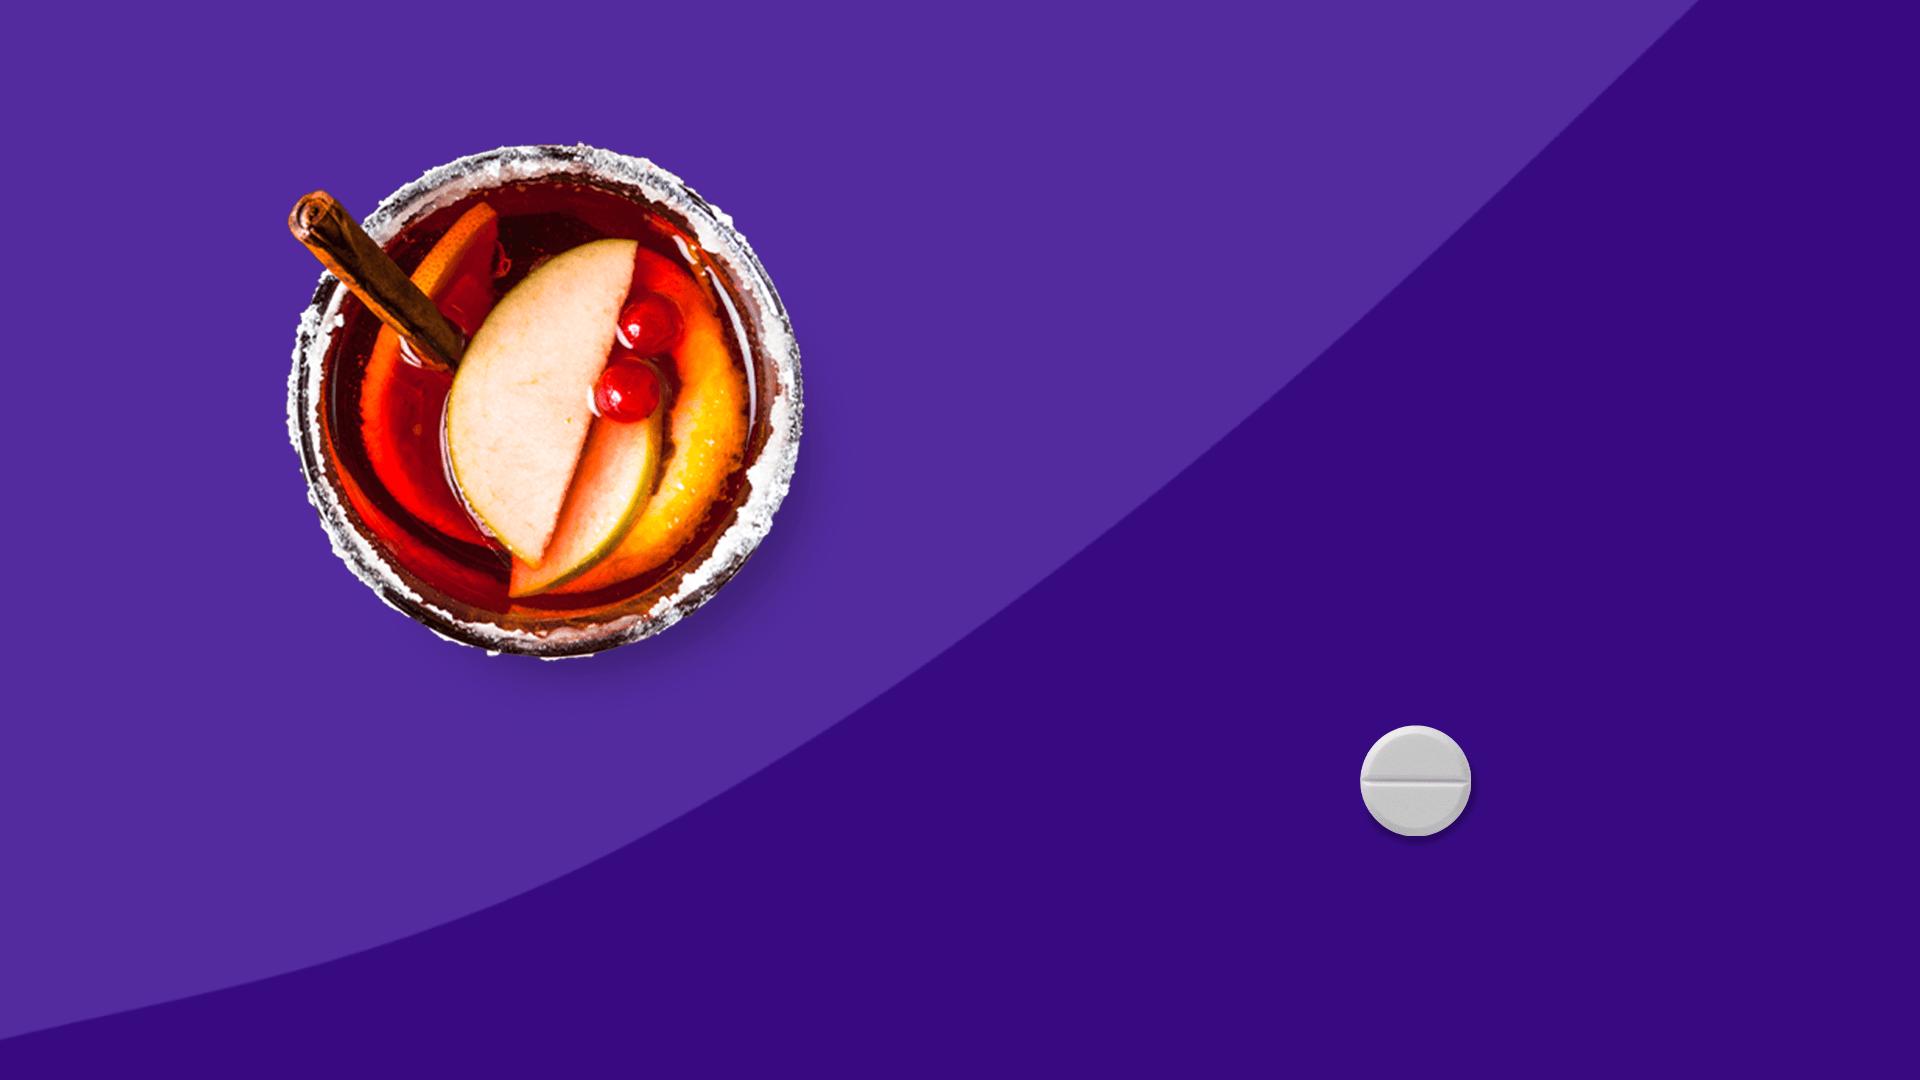 Alcohol and nausea medicine: Can I mix Dramamine and alcohol?